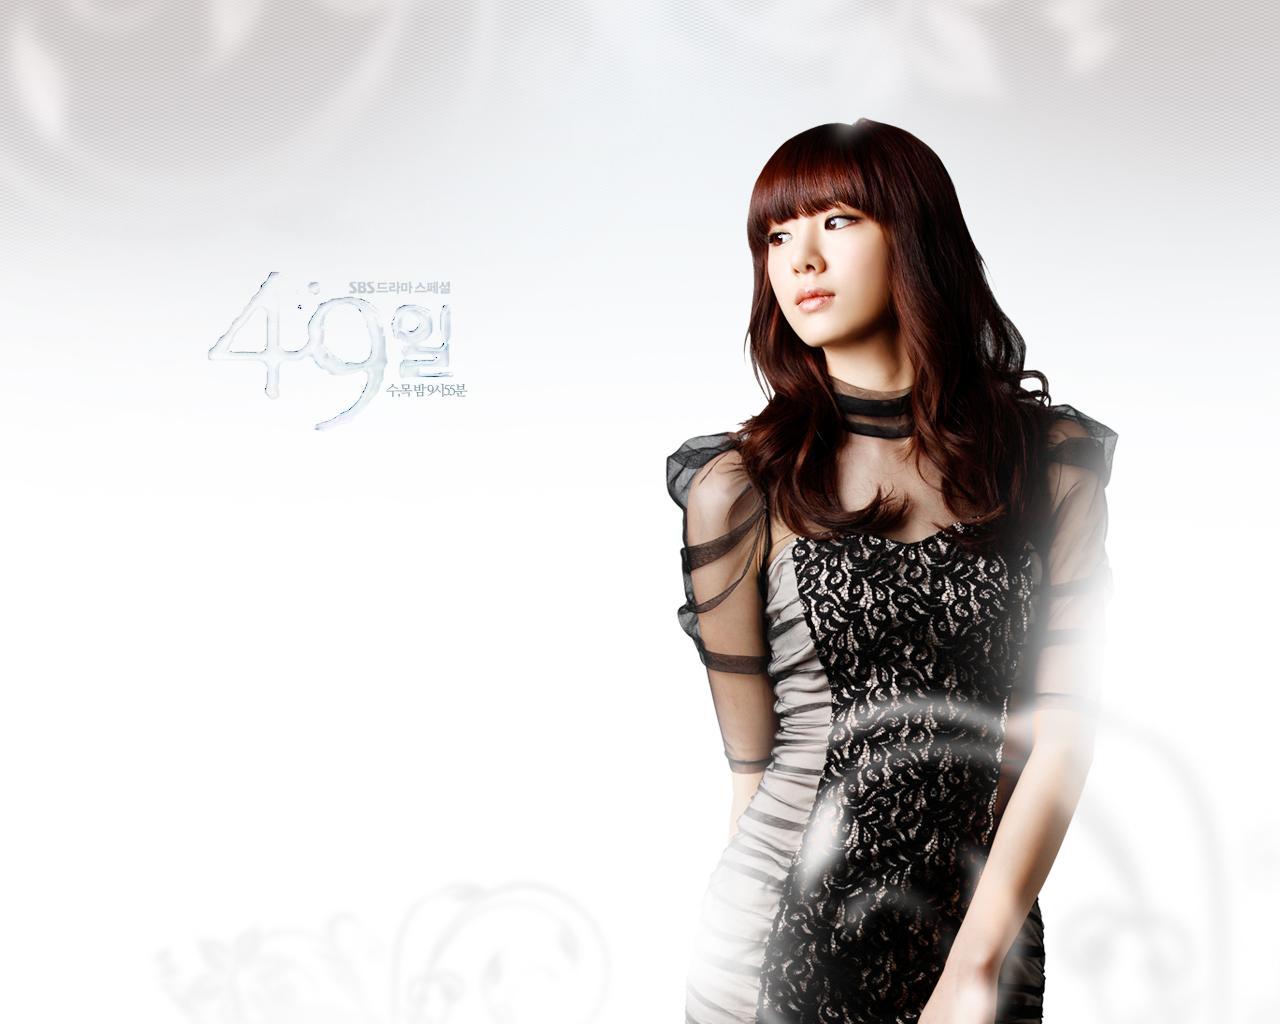 http://korean-cute.sosugary.com/albums/userpics/10001/133.jpg